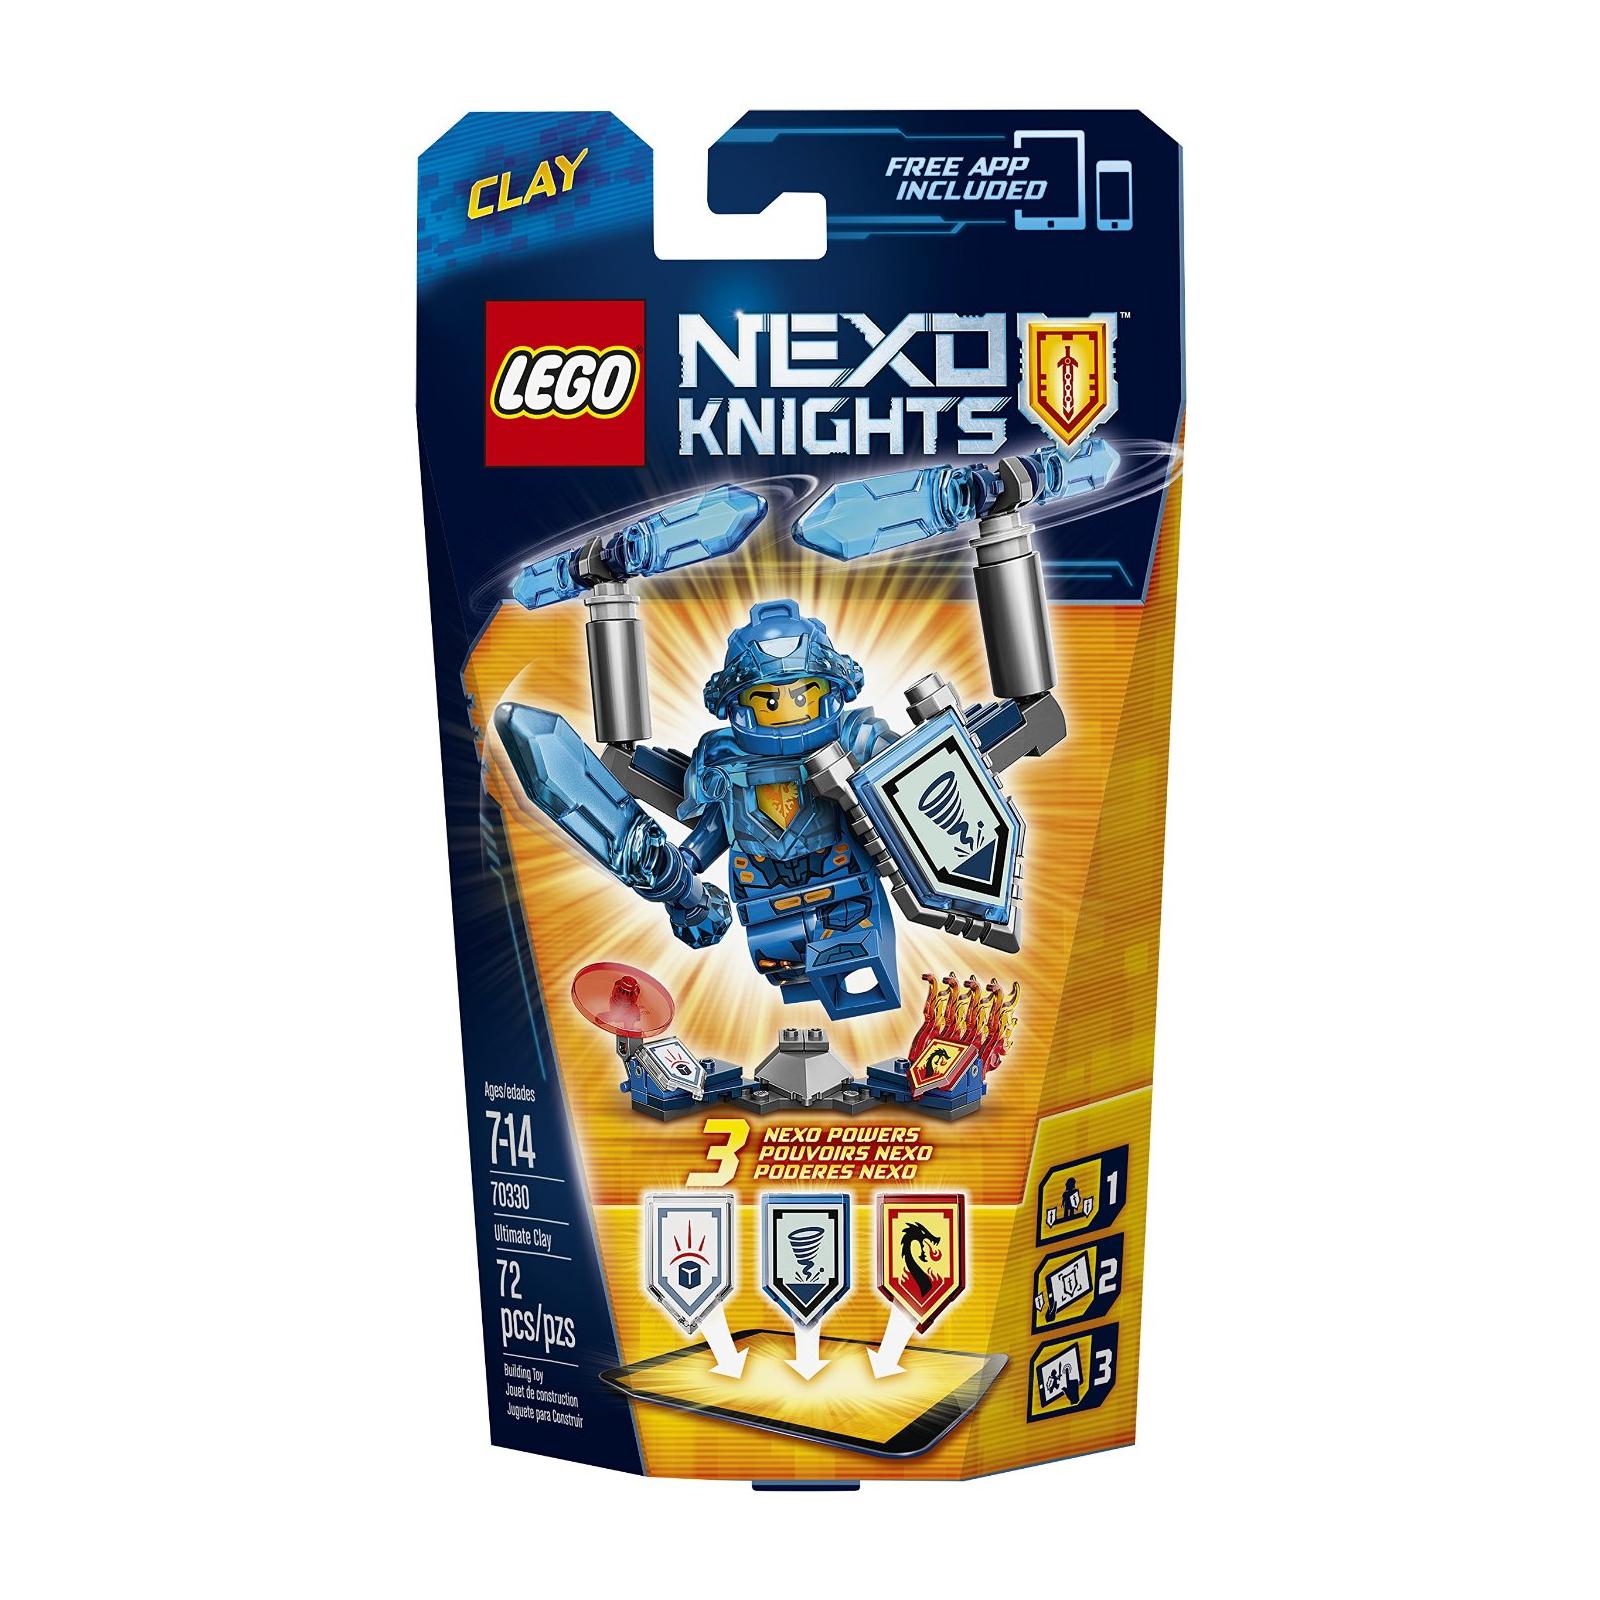 Конструктор LEGO Nexo Knights Клэй Абсолютная сила (70330) изображение 9